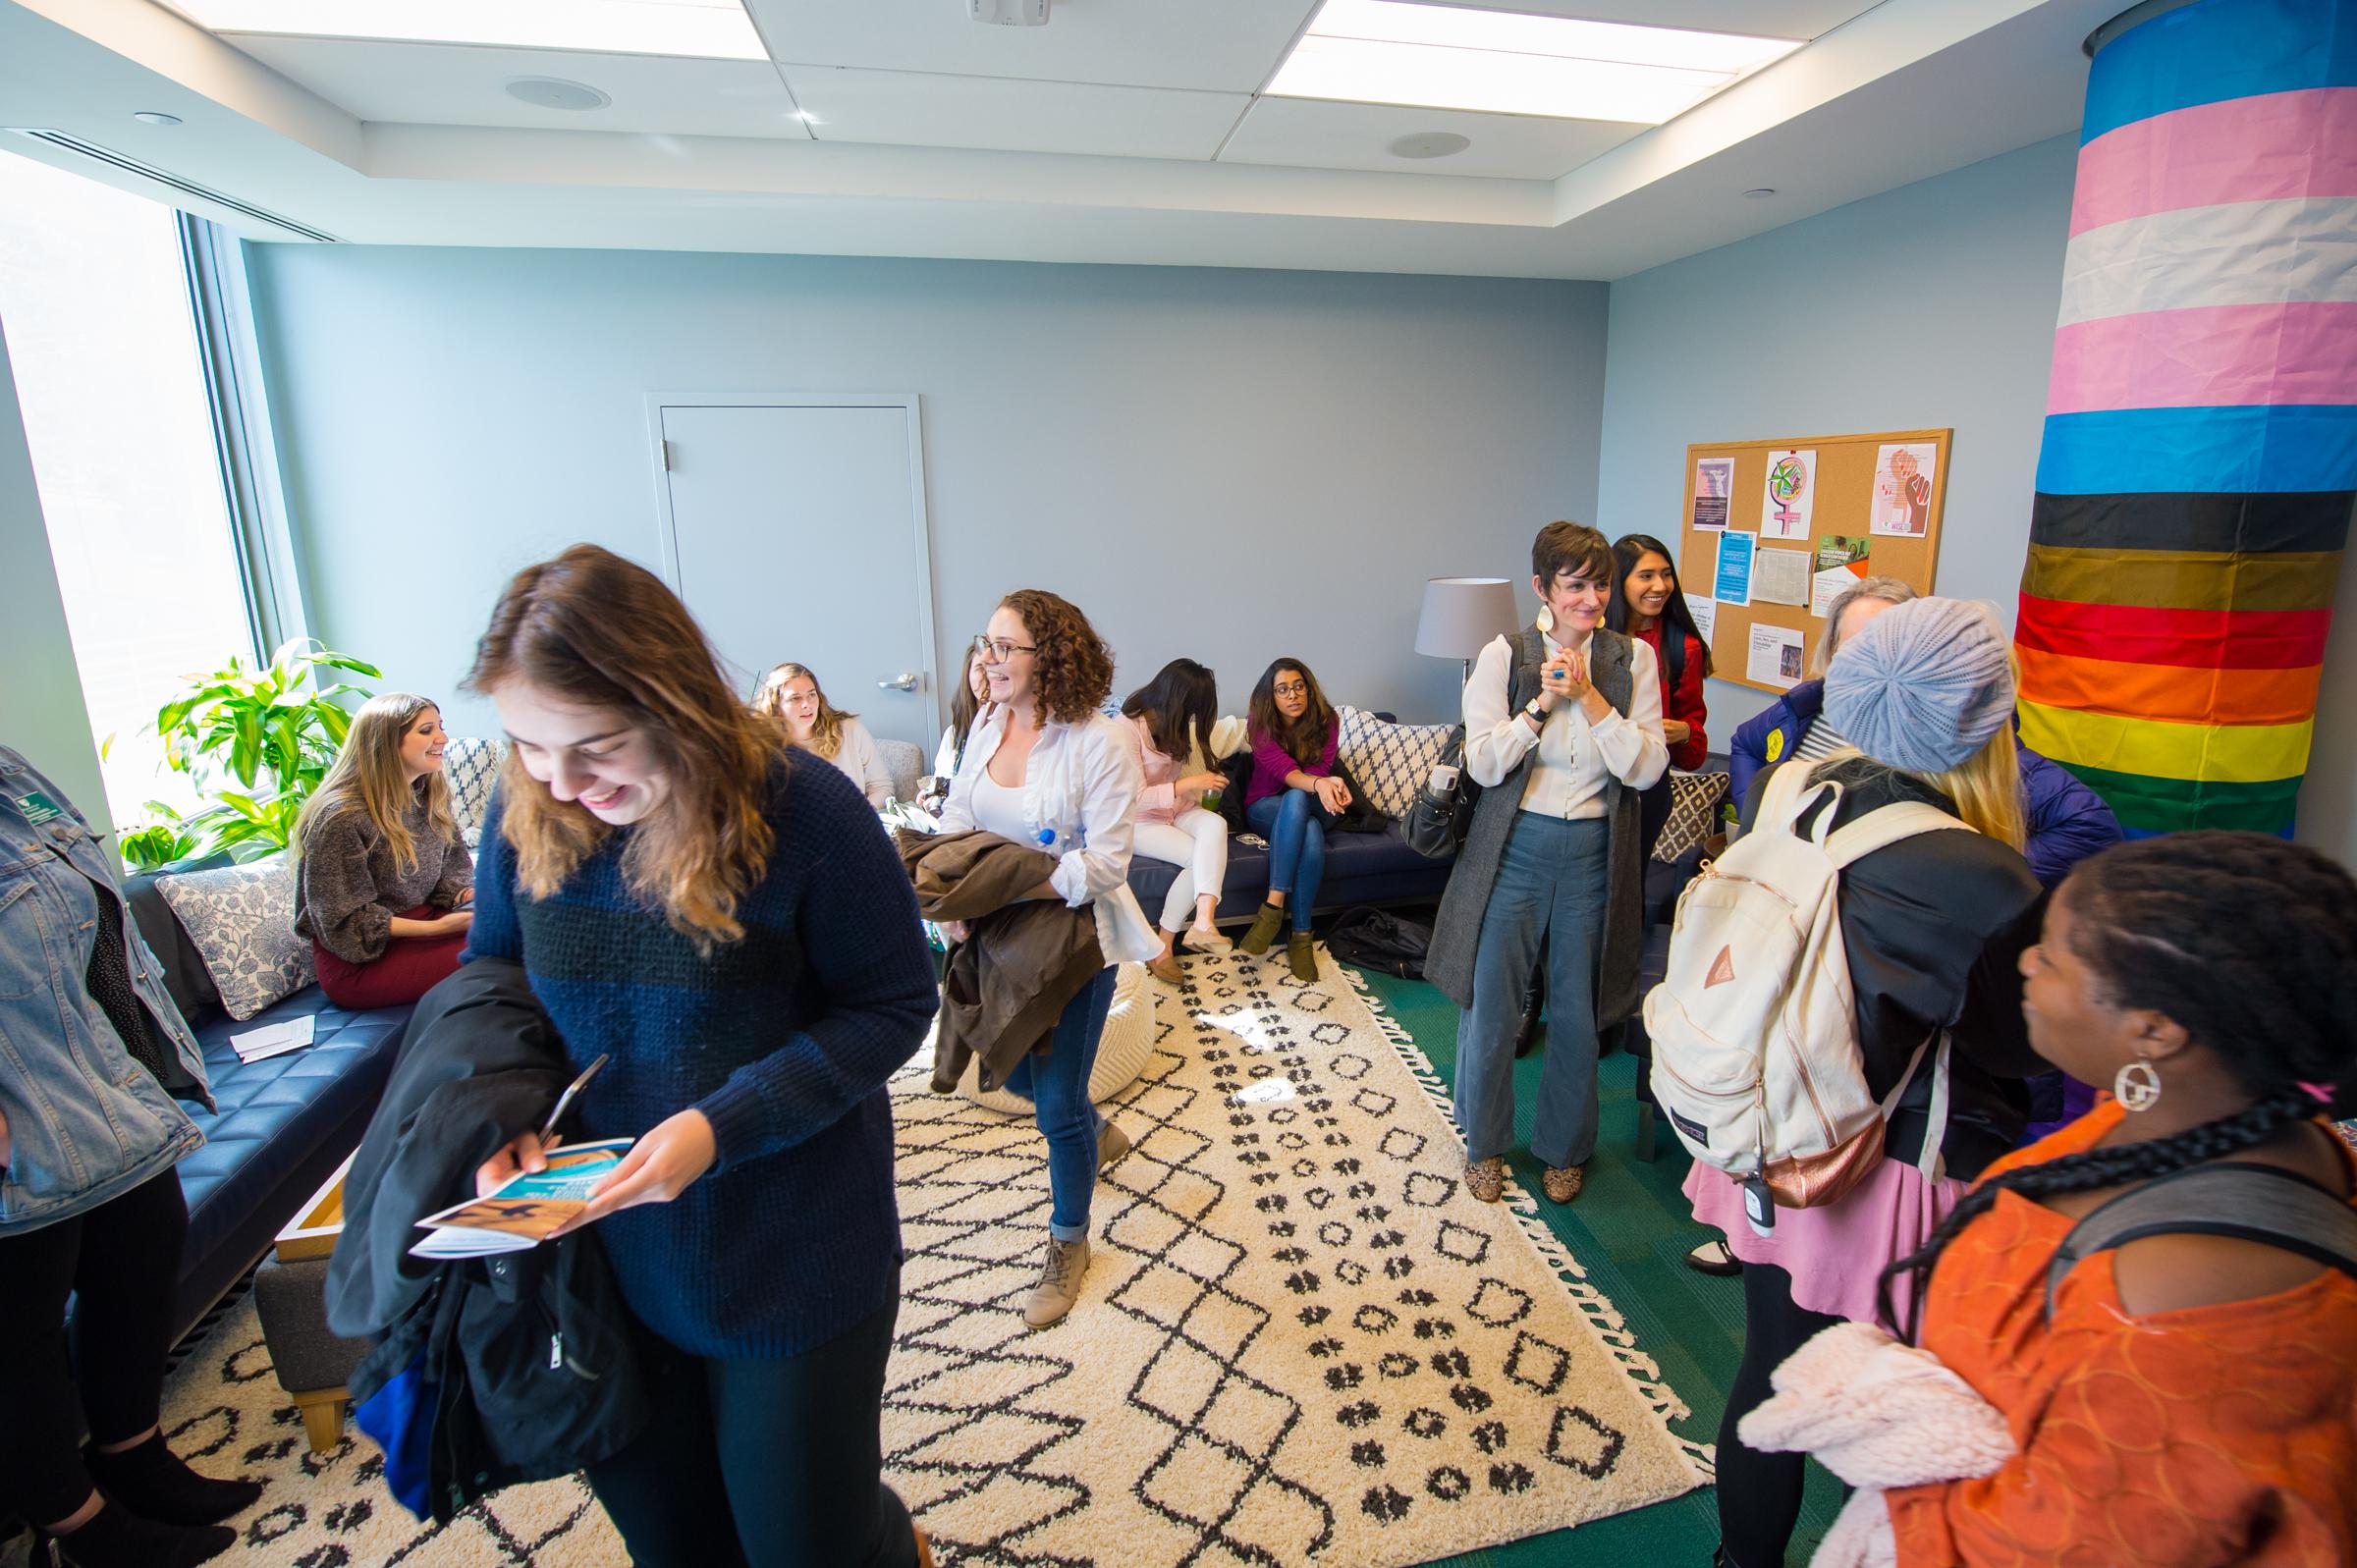 10.19.18-Lasallian-Women-and-Gender-Resource-Center-Ribbon-Cutting-Cuppek-189.jpg